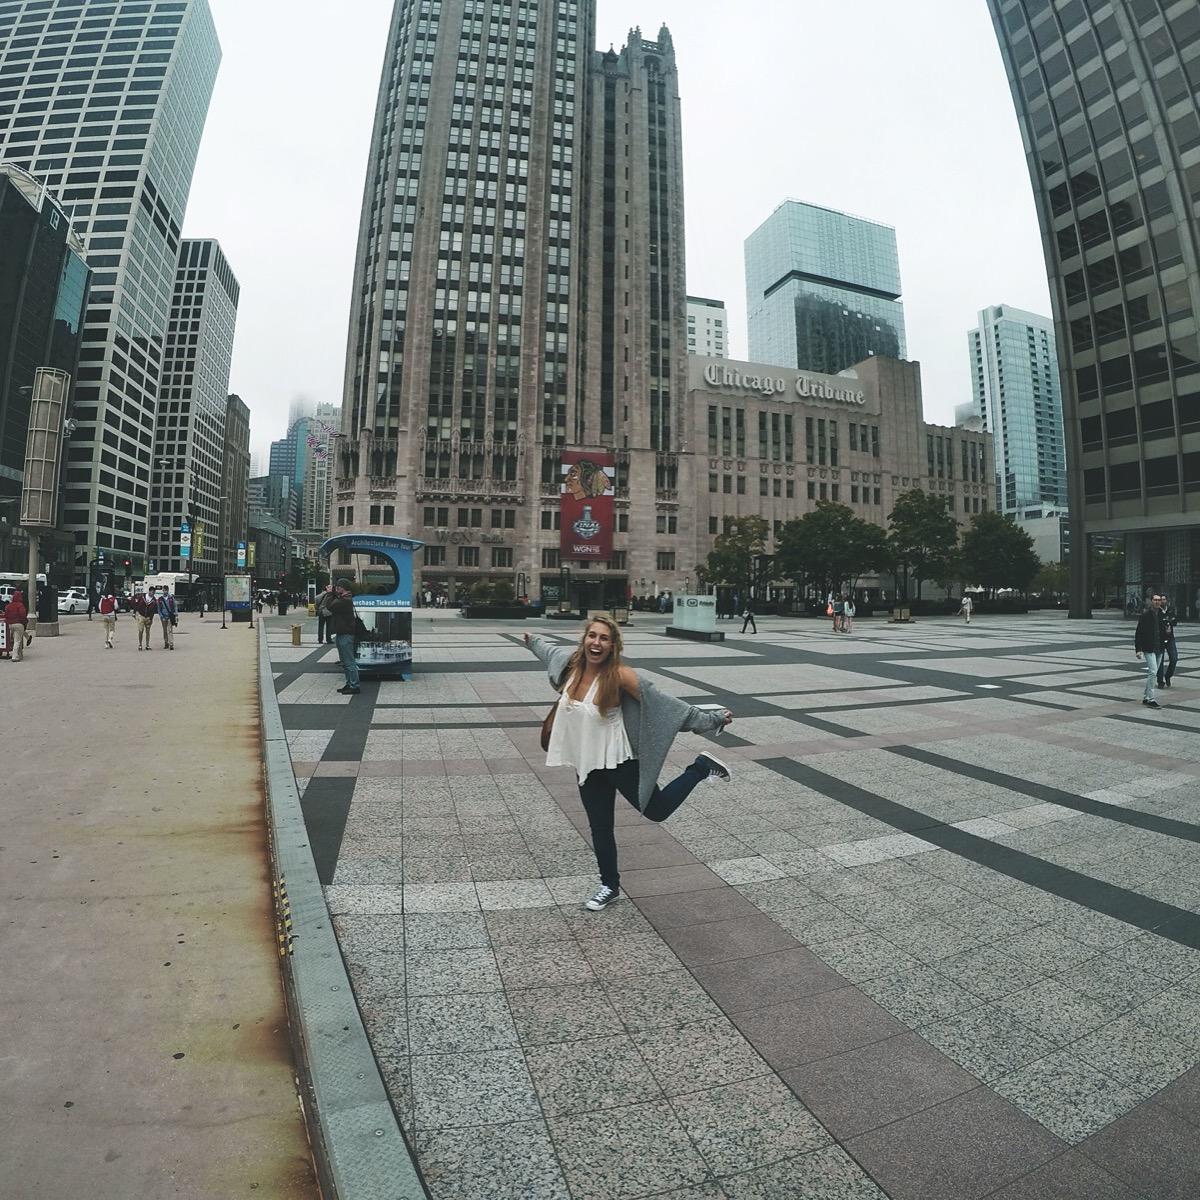 ChicagoSilly